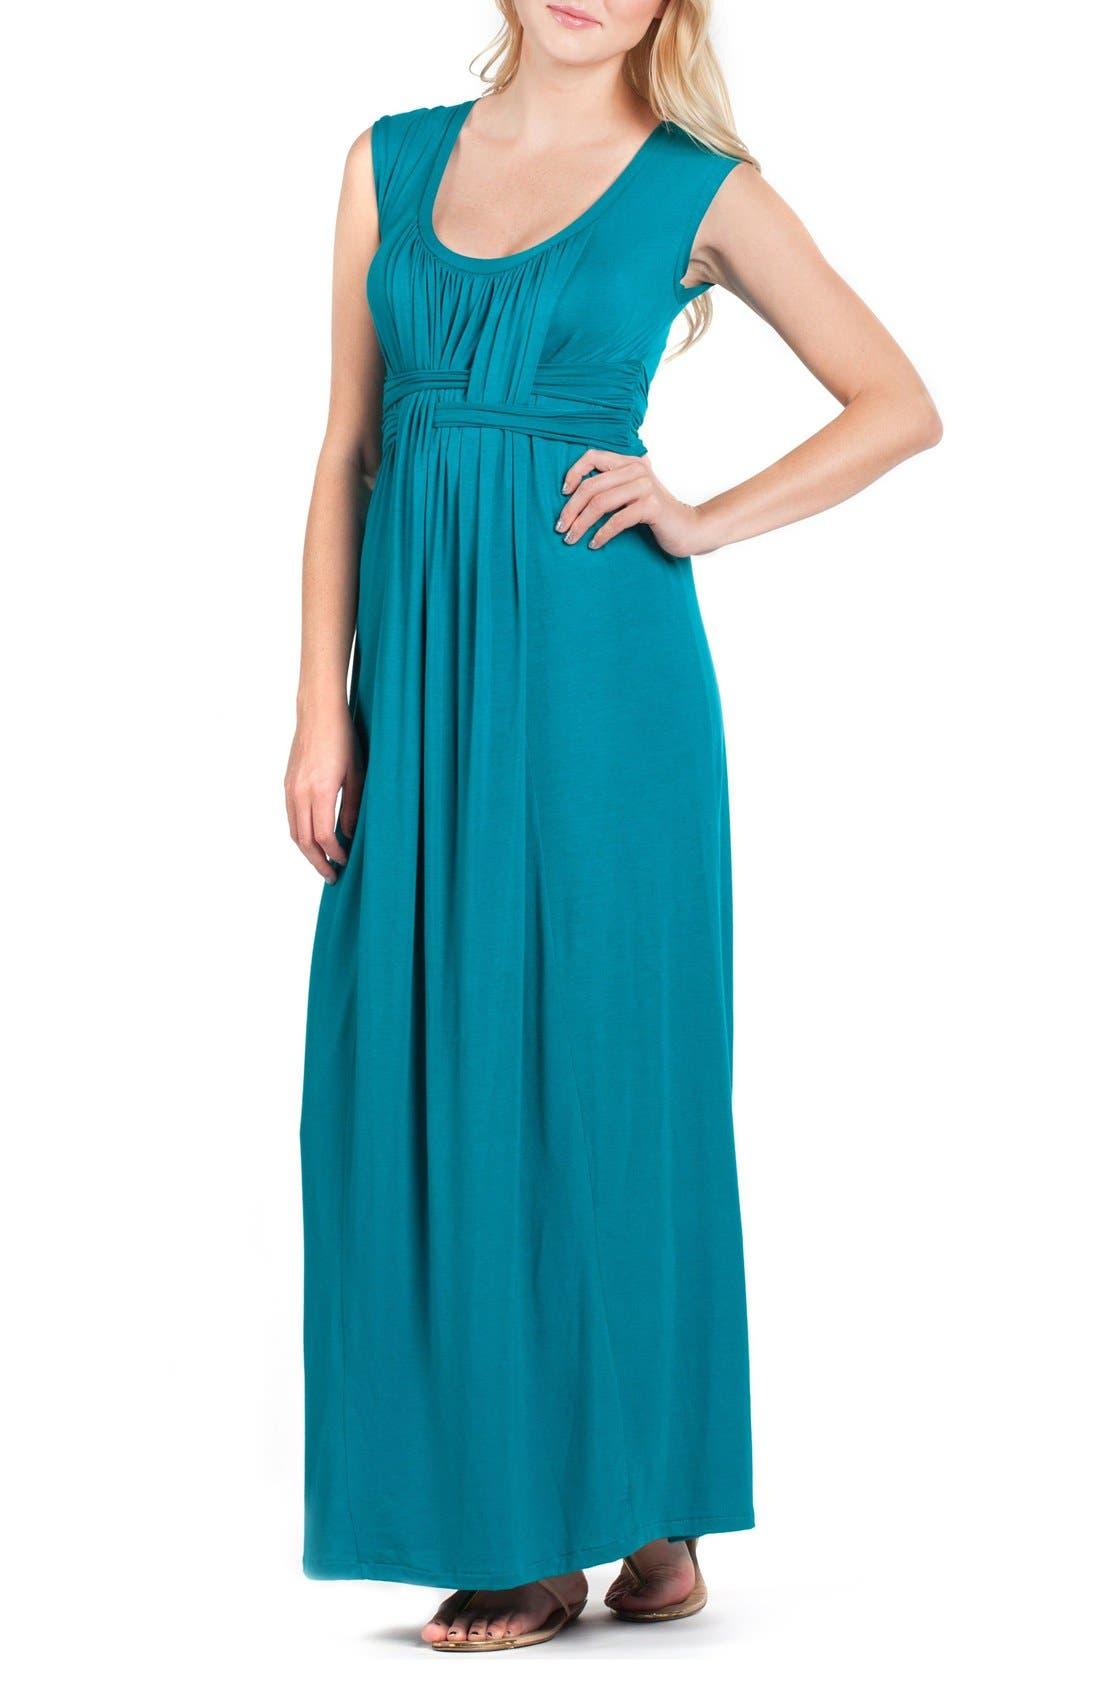 Athens Maternity/Nursing Maxi Dress,                             Alternate thumbnail 4, color,                             JADE